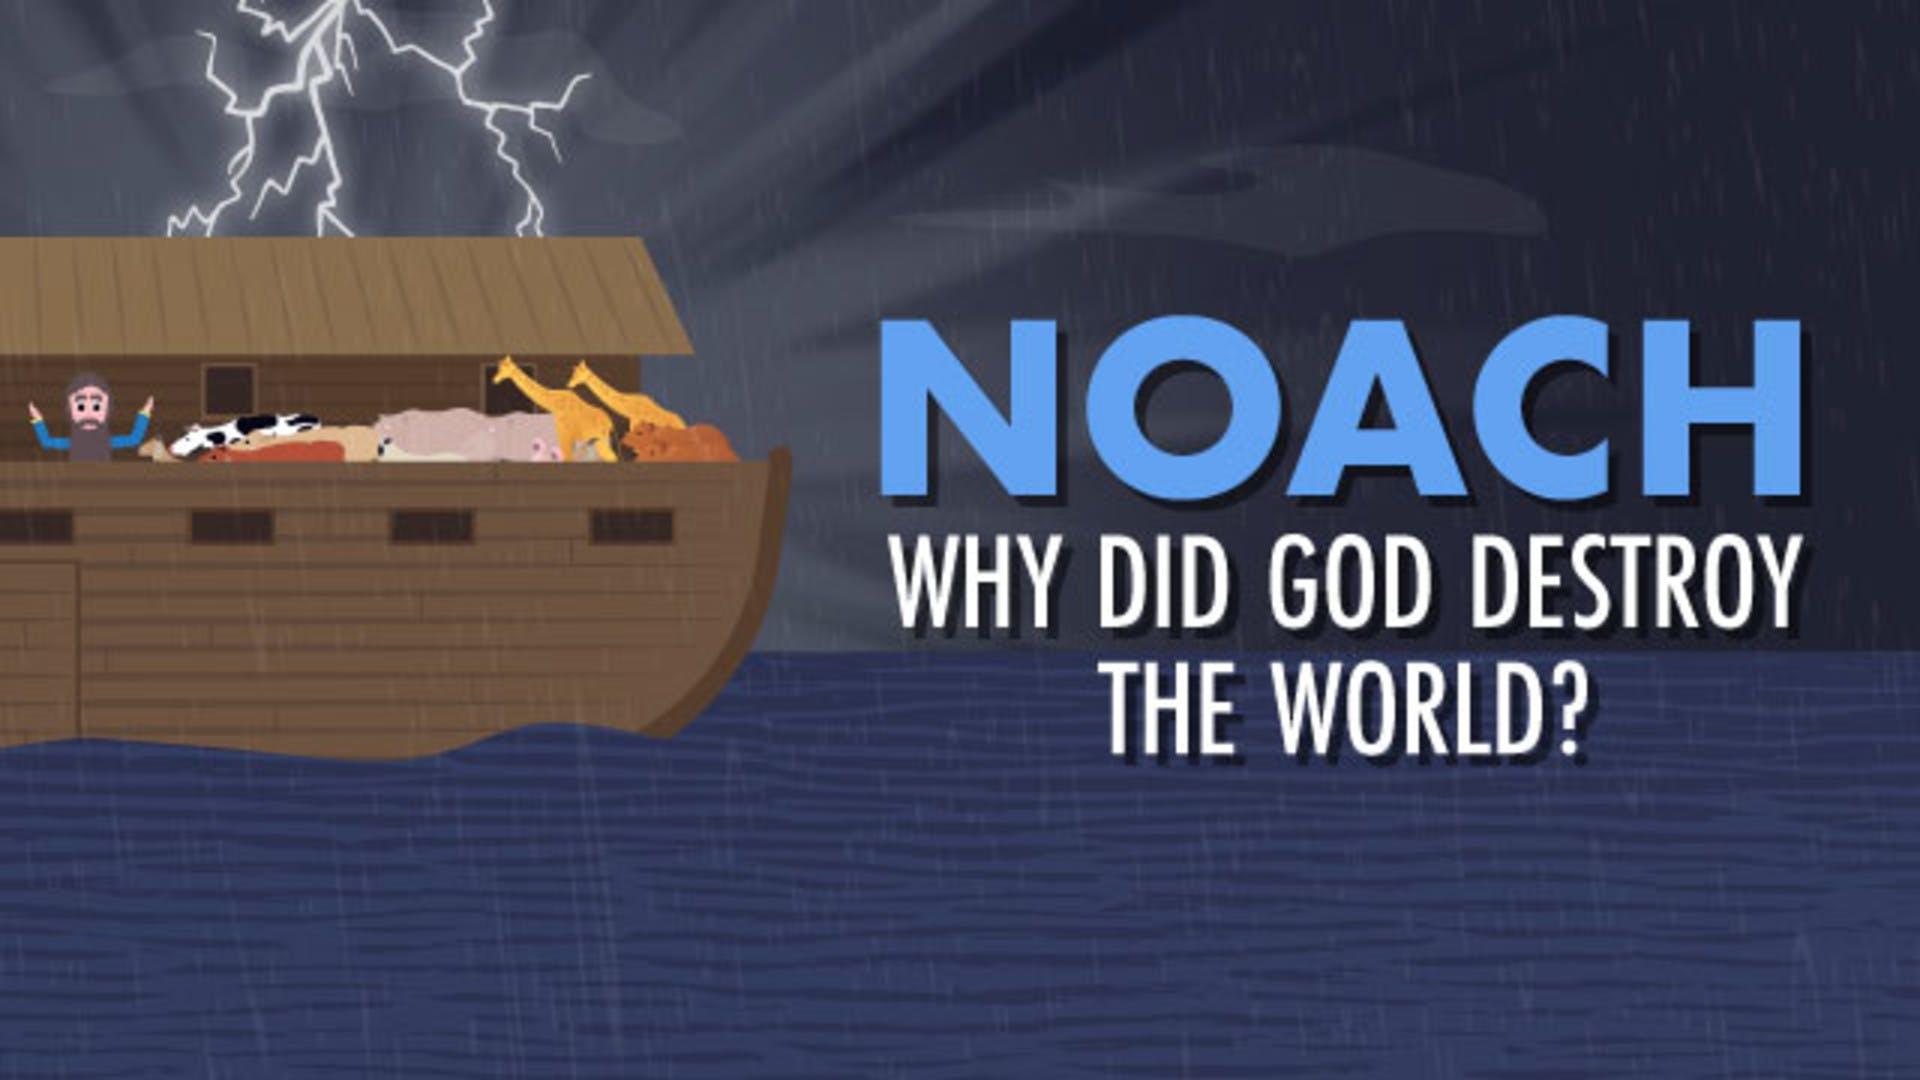 Why did God destroy the world